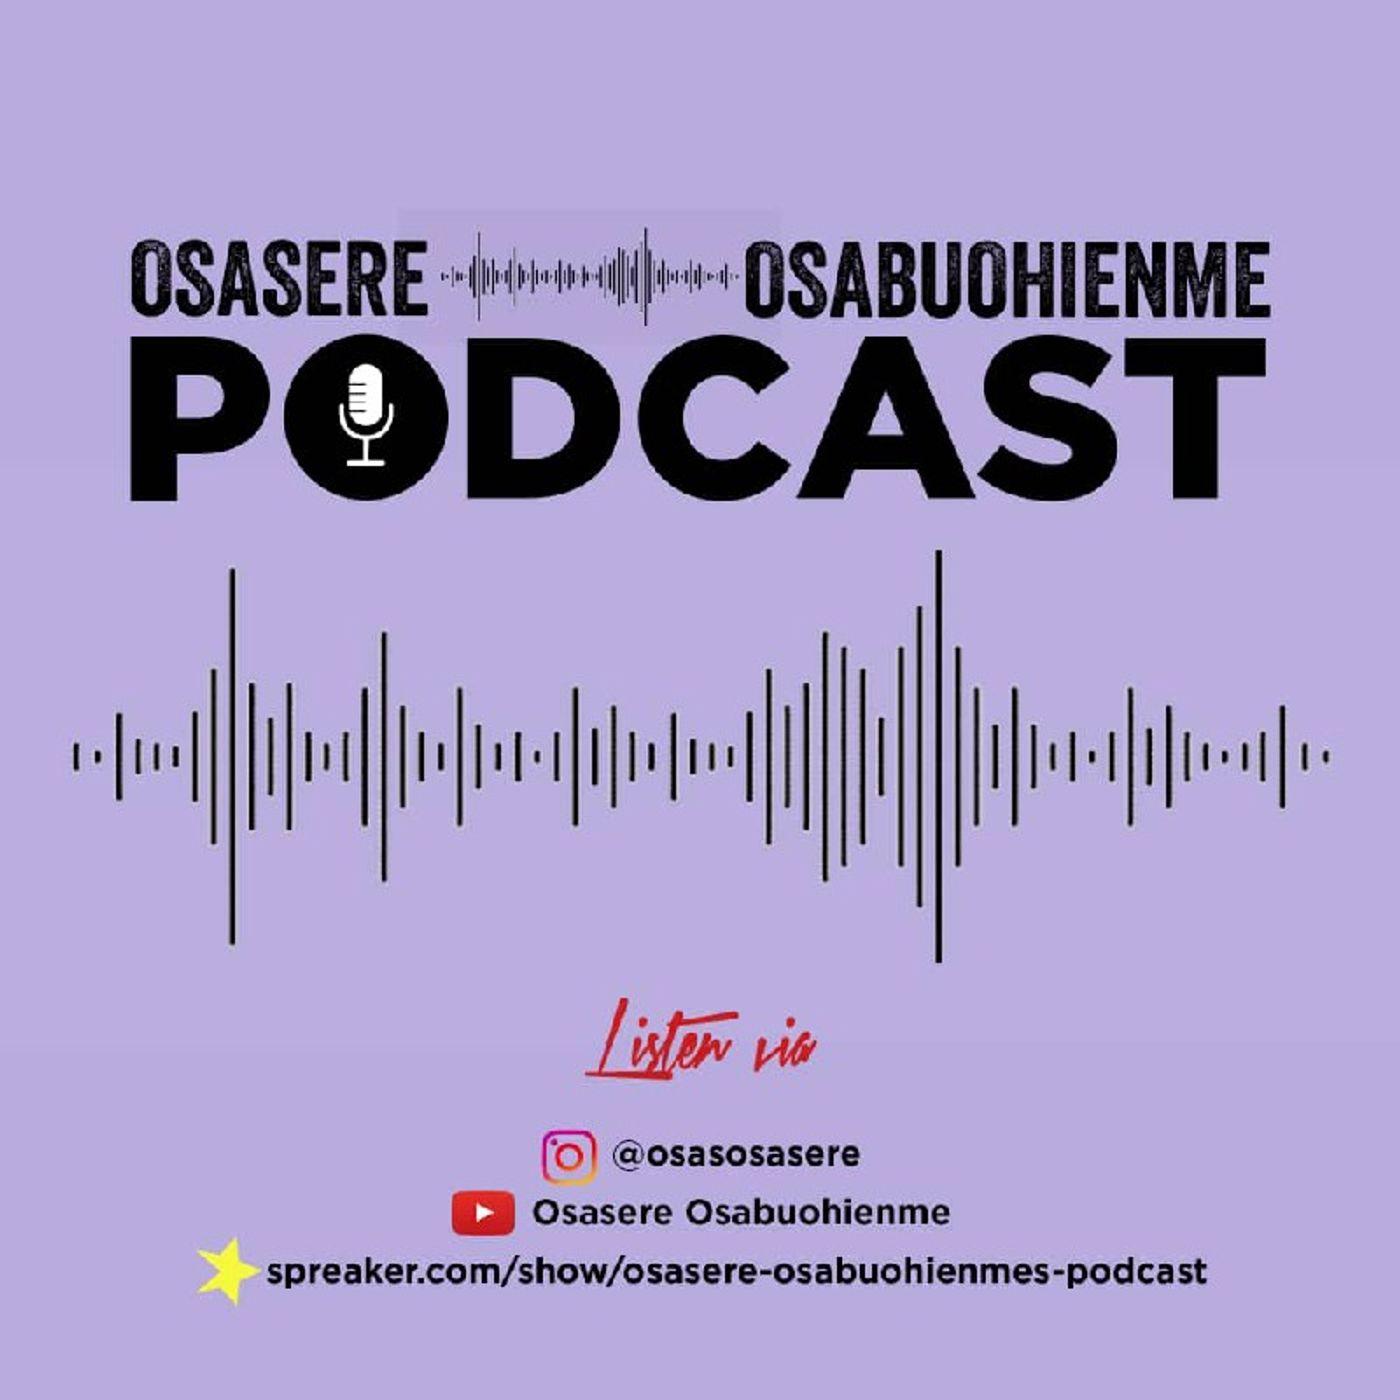 osasere osabuohienme's podcast on Jamit